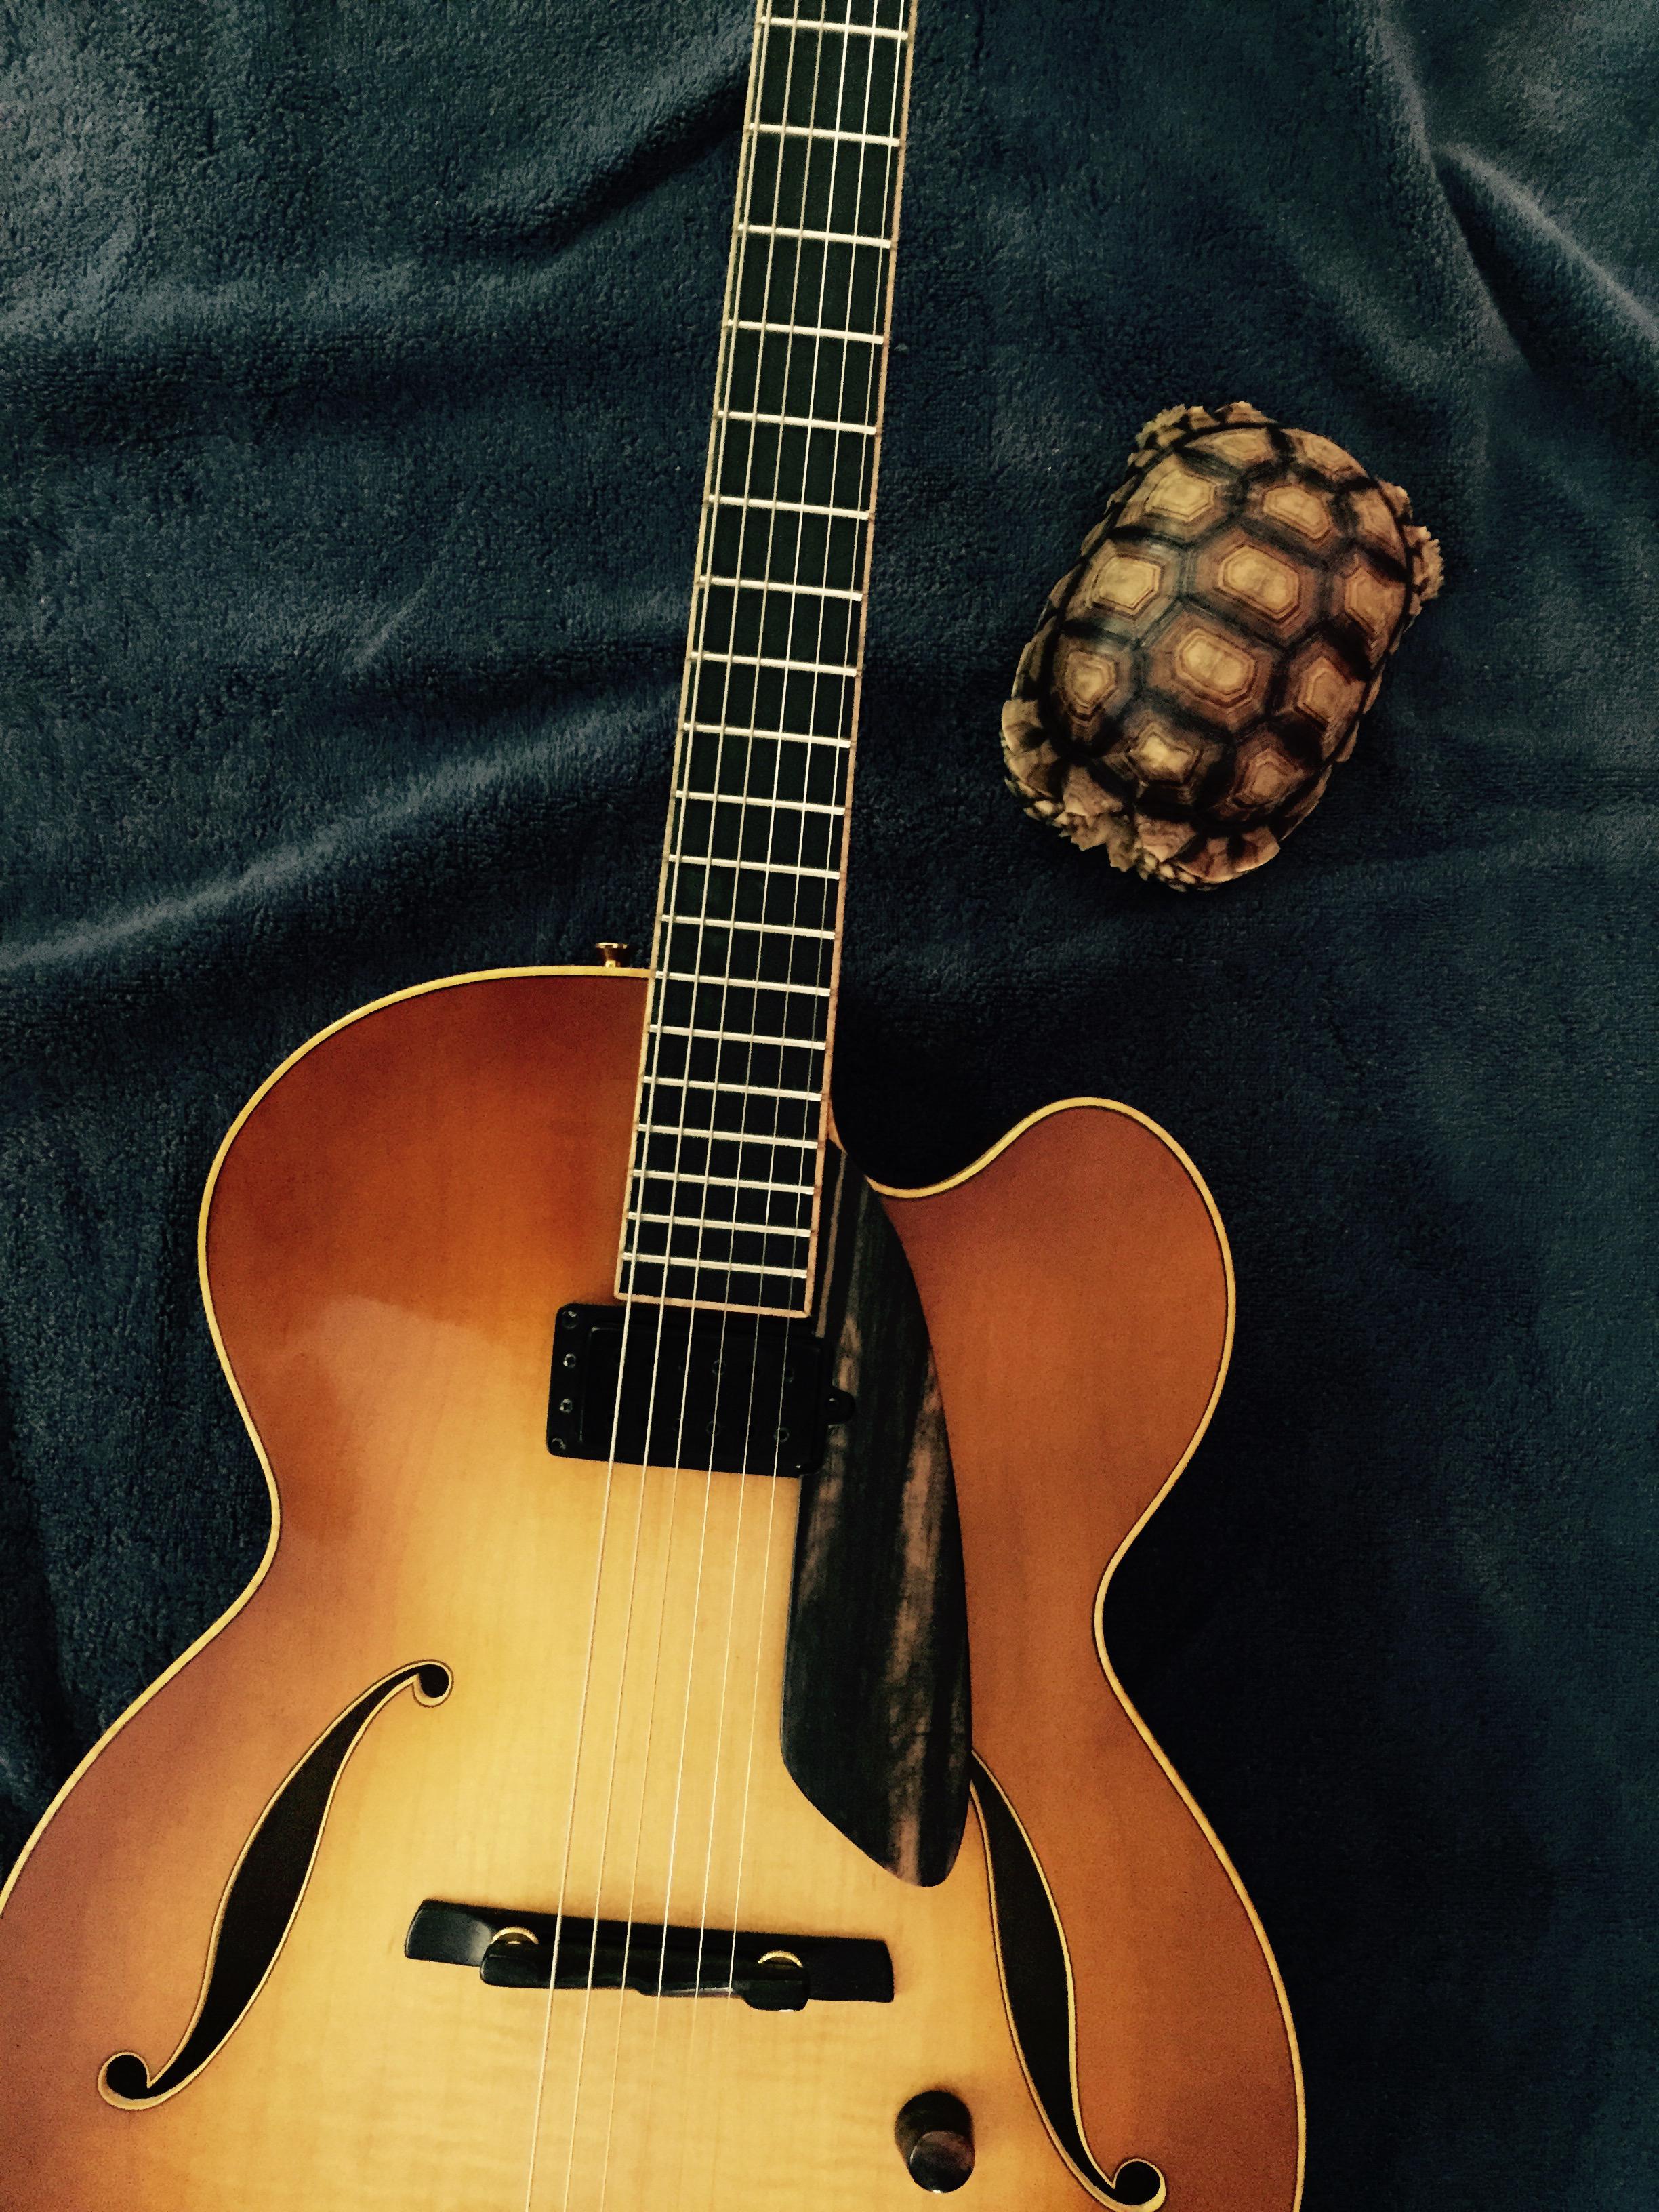 borys_guitars_friends_138.jpg